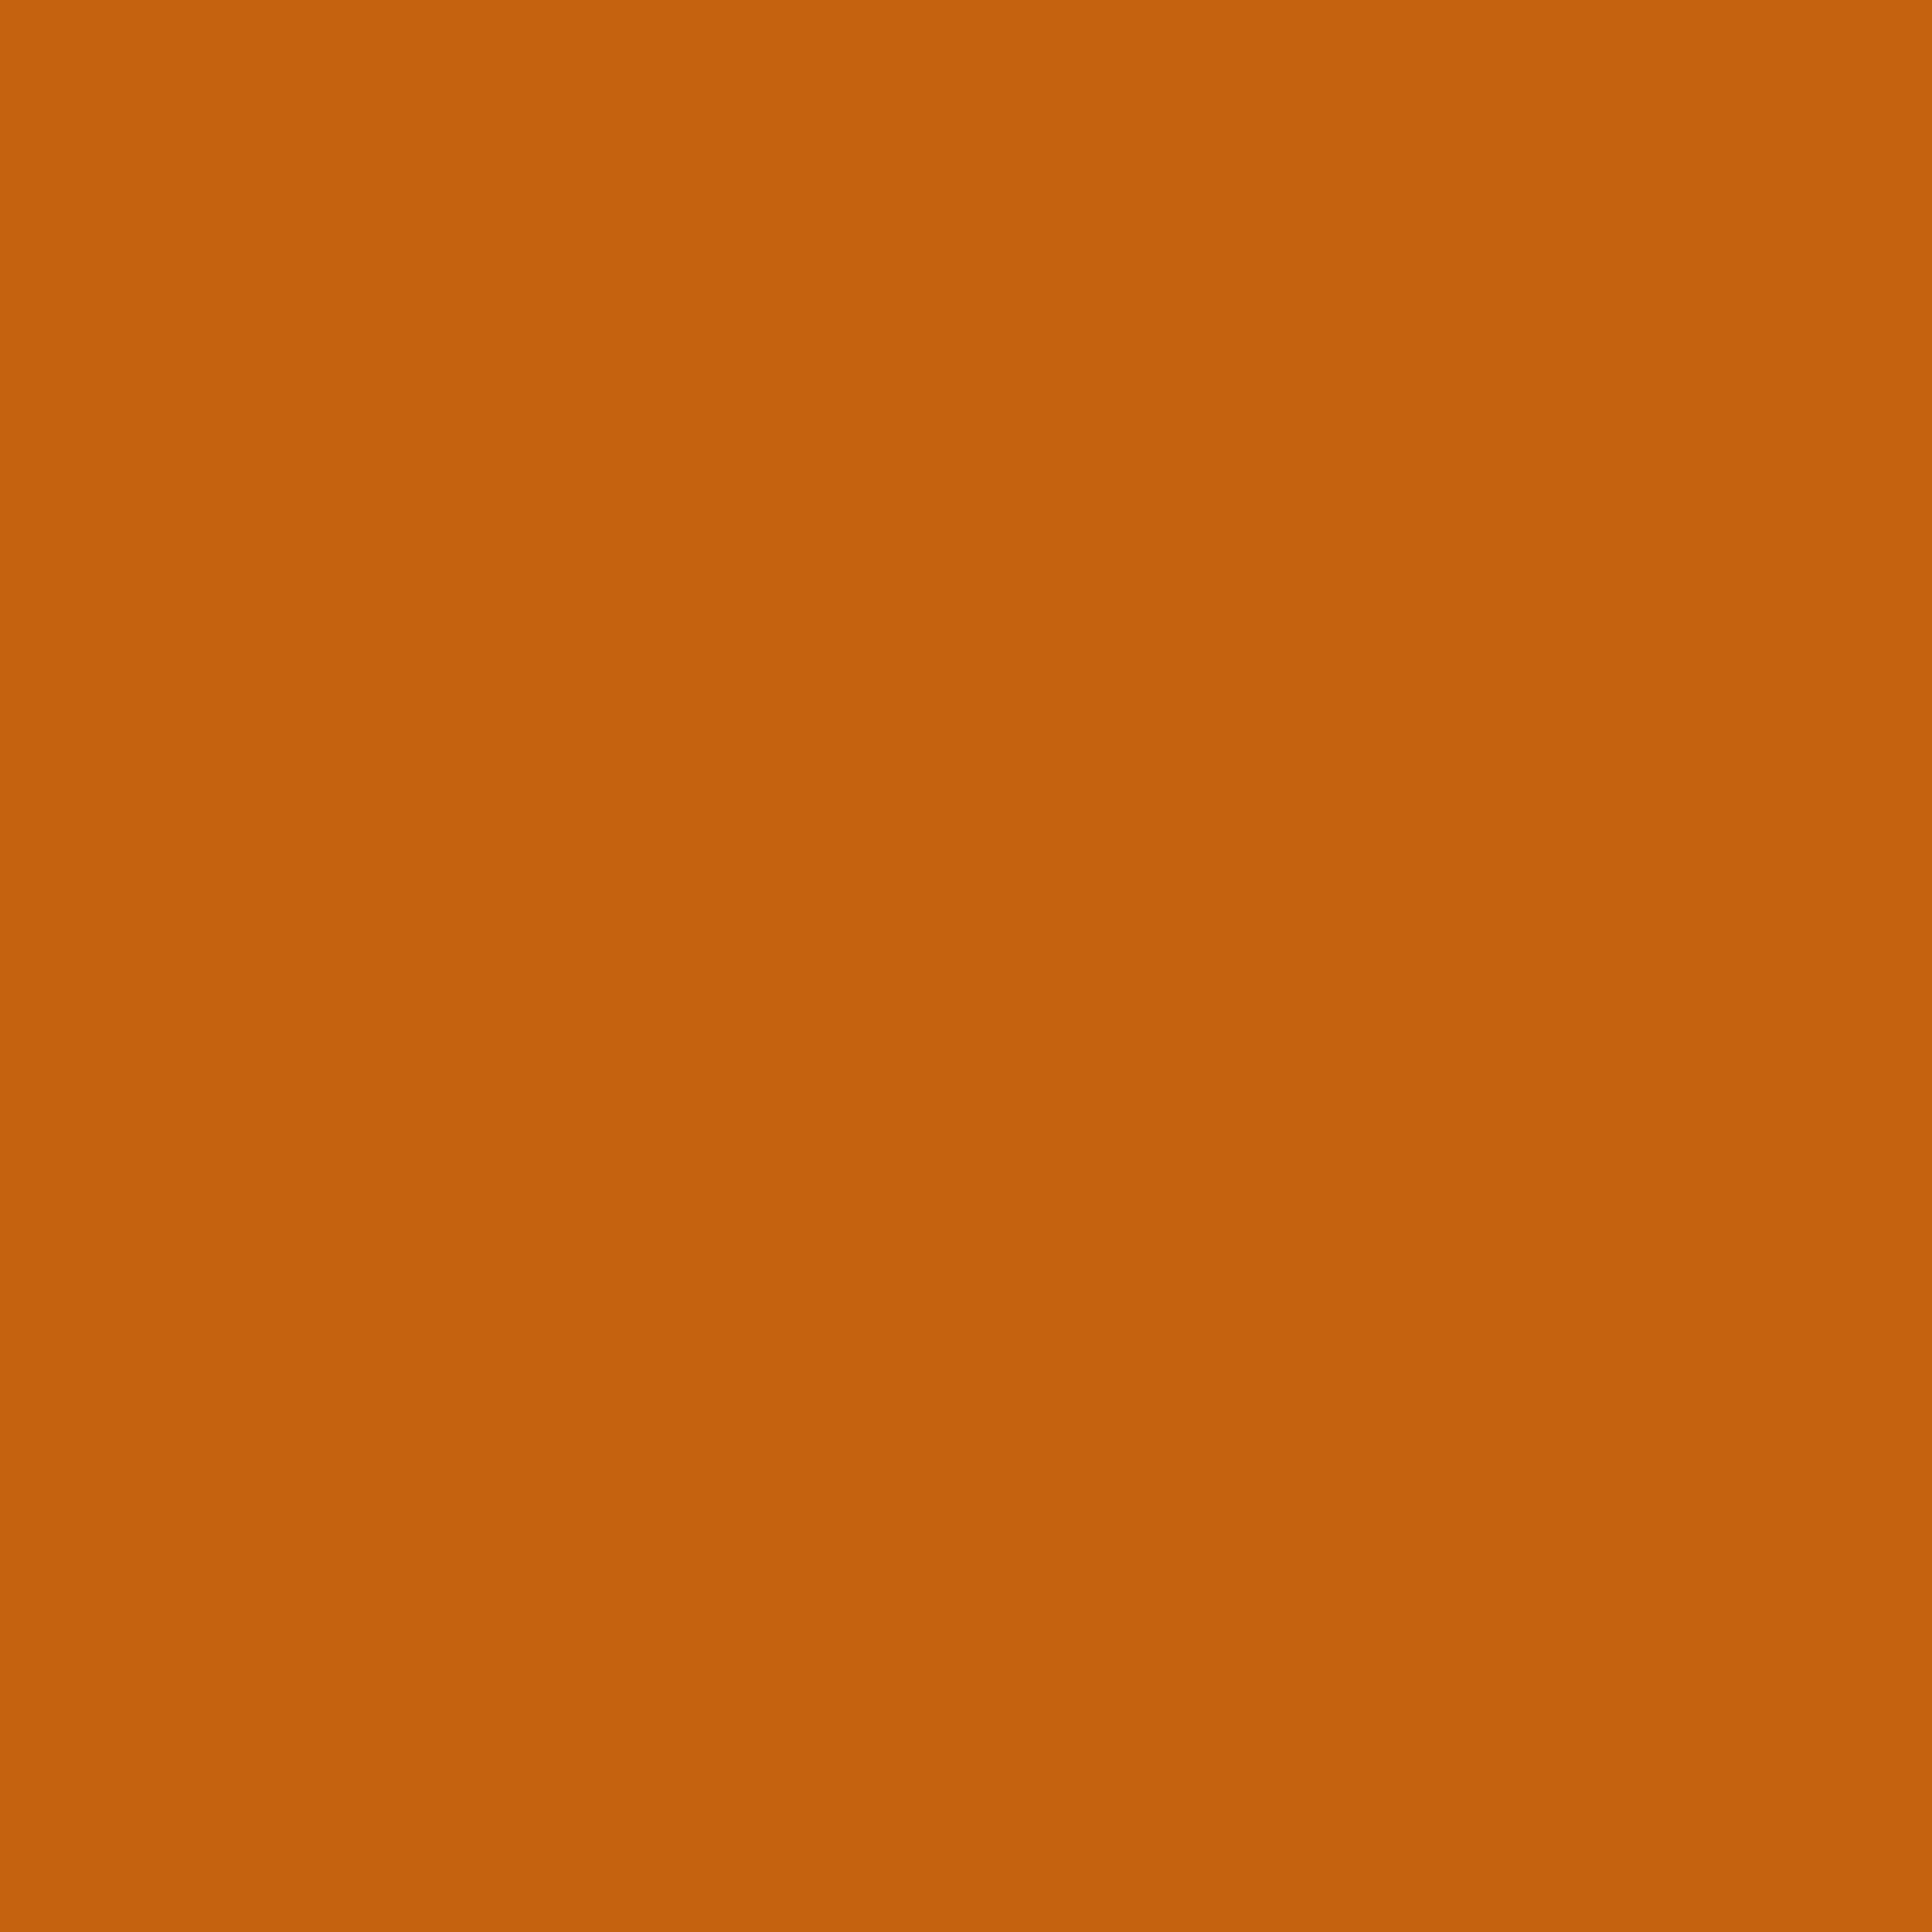 3600x3600 Alloy Orange Solid Color Background